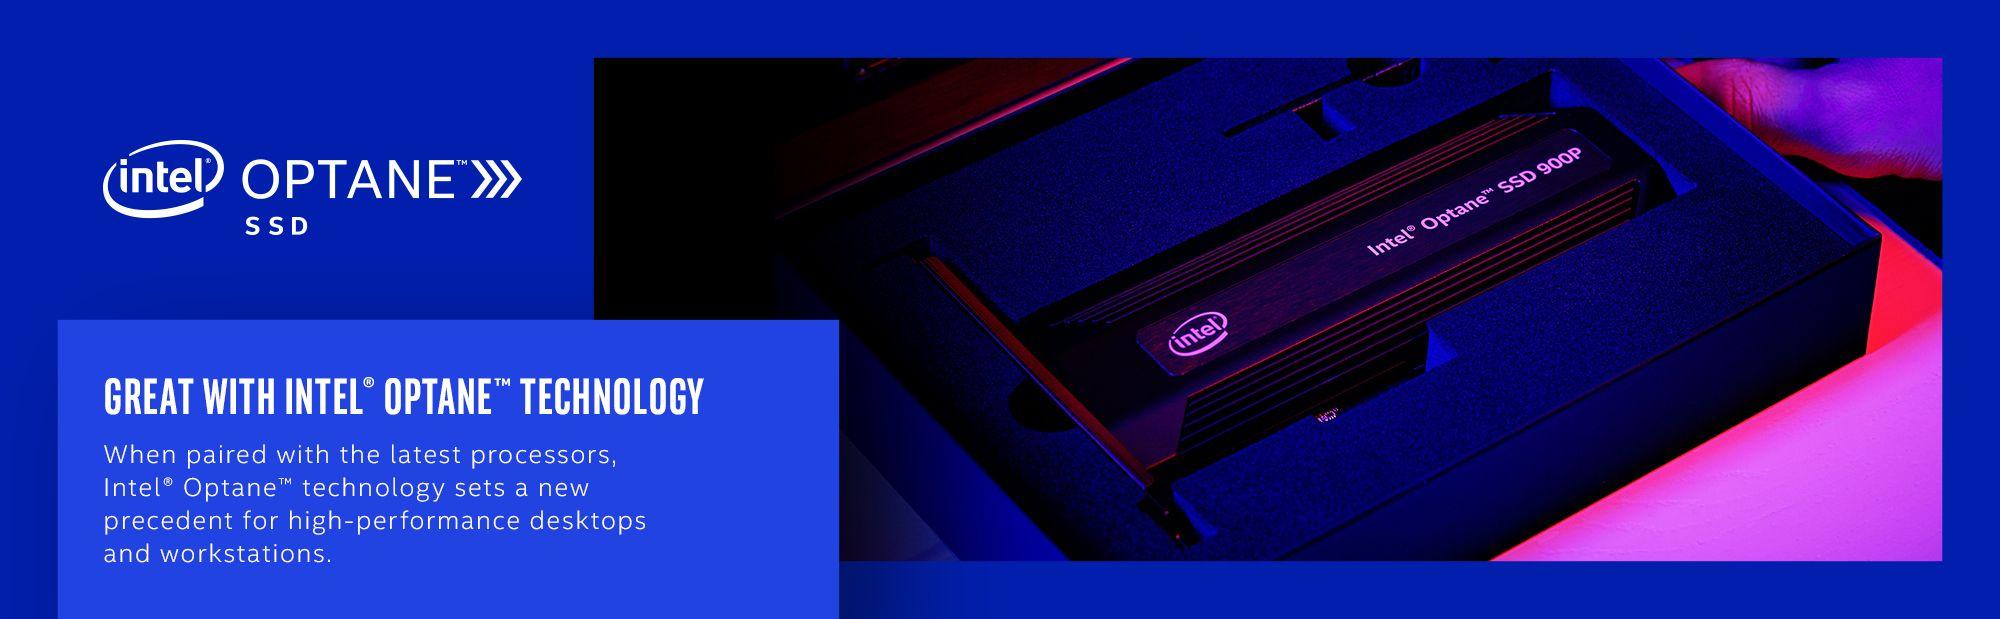 Intel Core i7-8700K Coffee Lake 6-Core 3 7 GHz (4 7 GHz Turbo) LGA 1151  (300 Series) 95W BX80684I78700K Desktop Processor Intel UHD Graphics 630 -